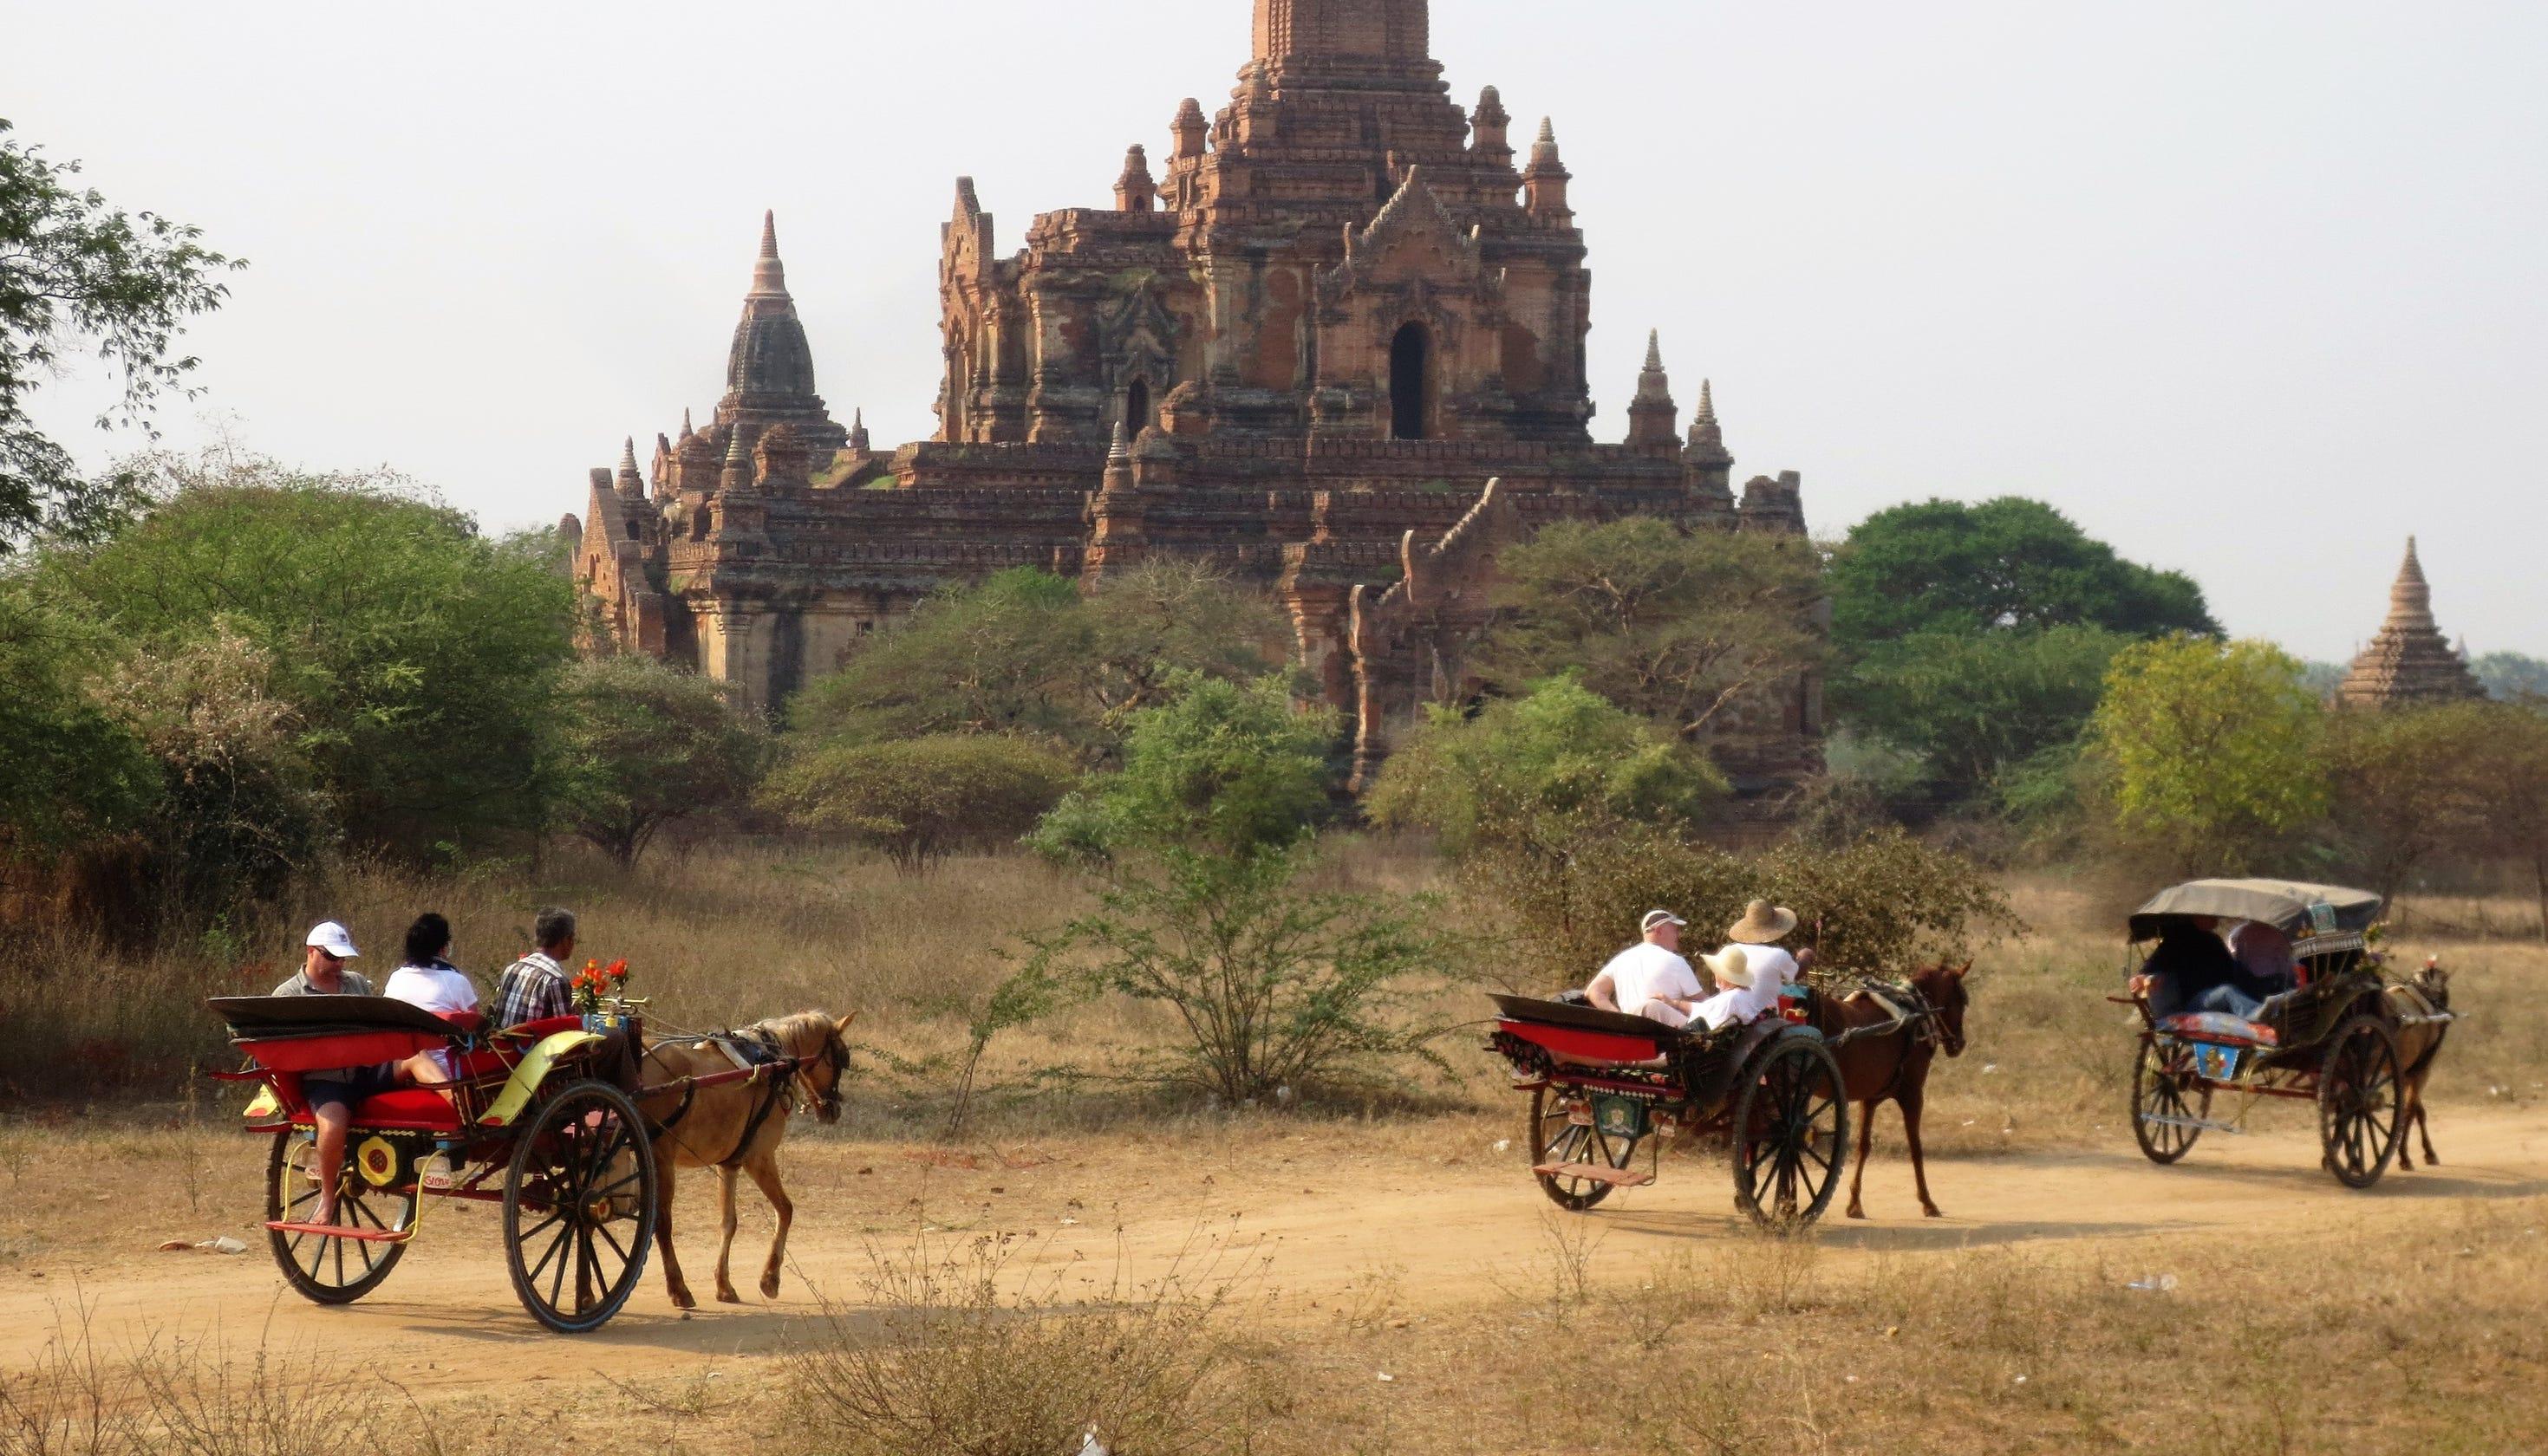 Myanmar travel: Should you go? Is it safe?